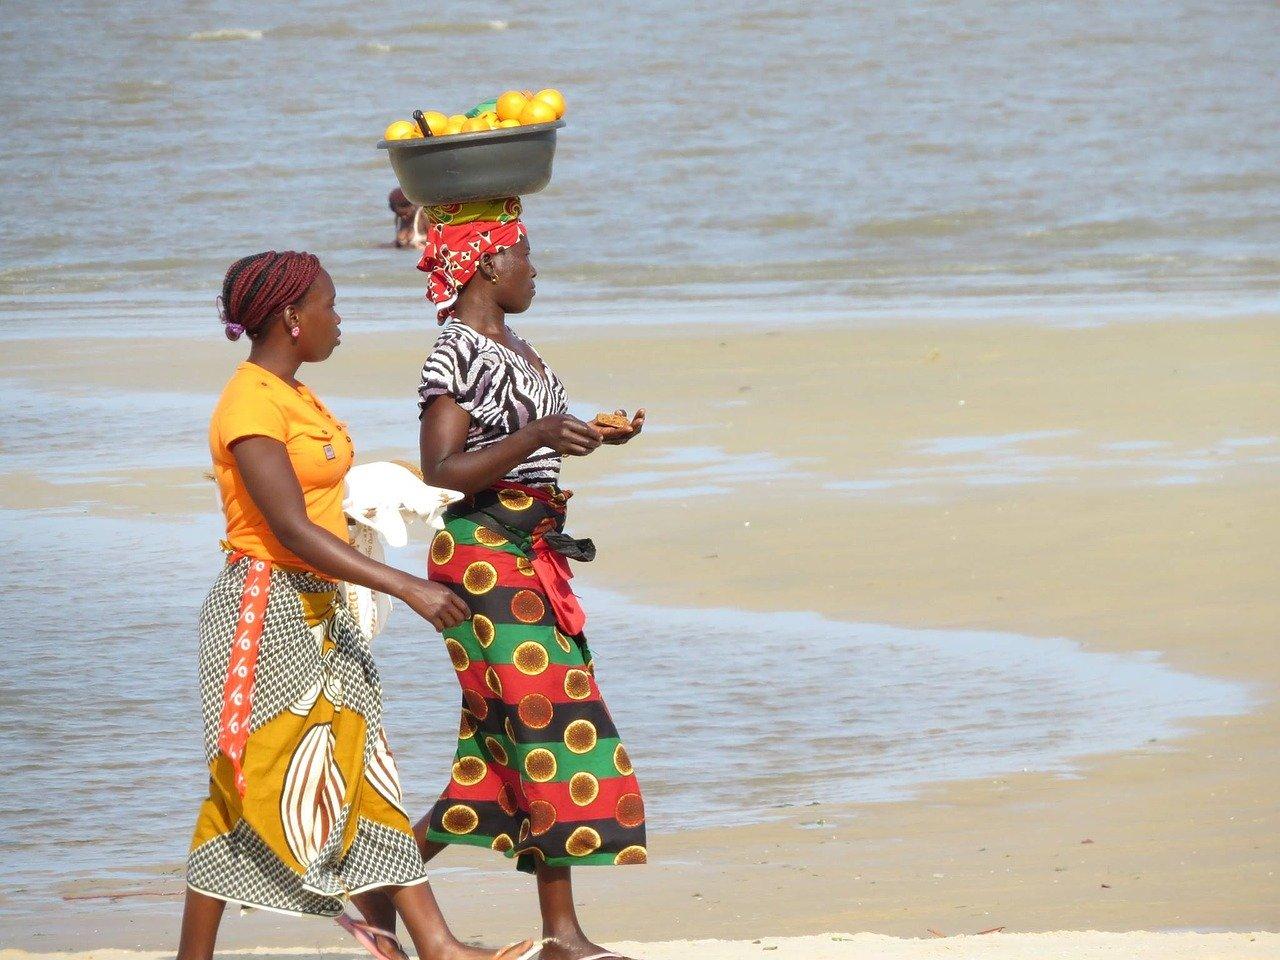 women on beach in Mozambique